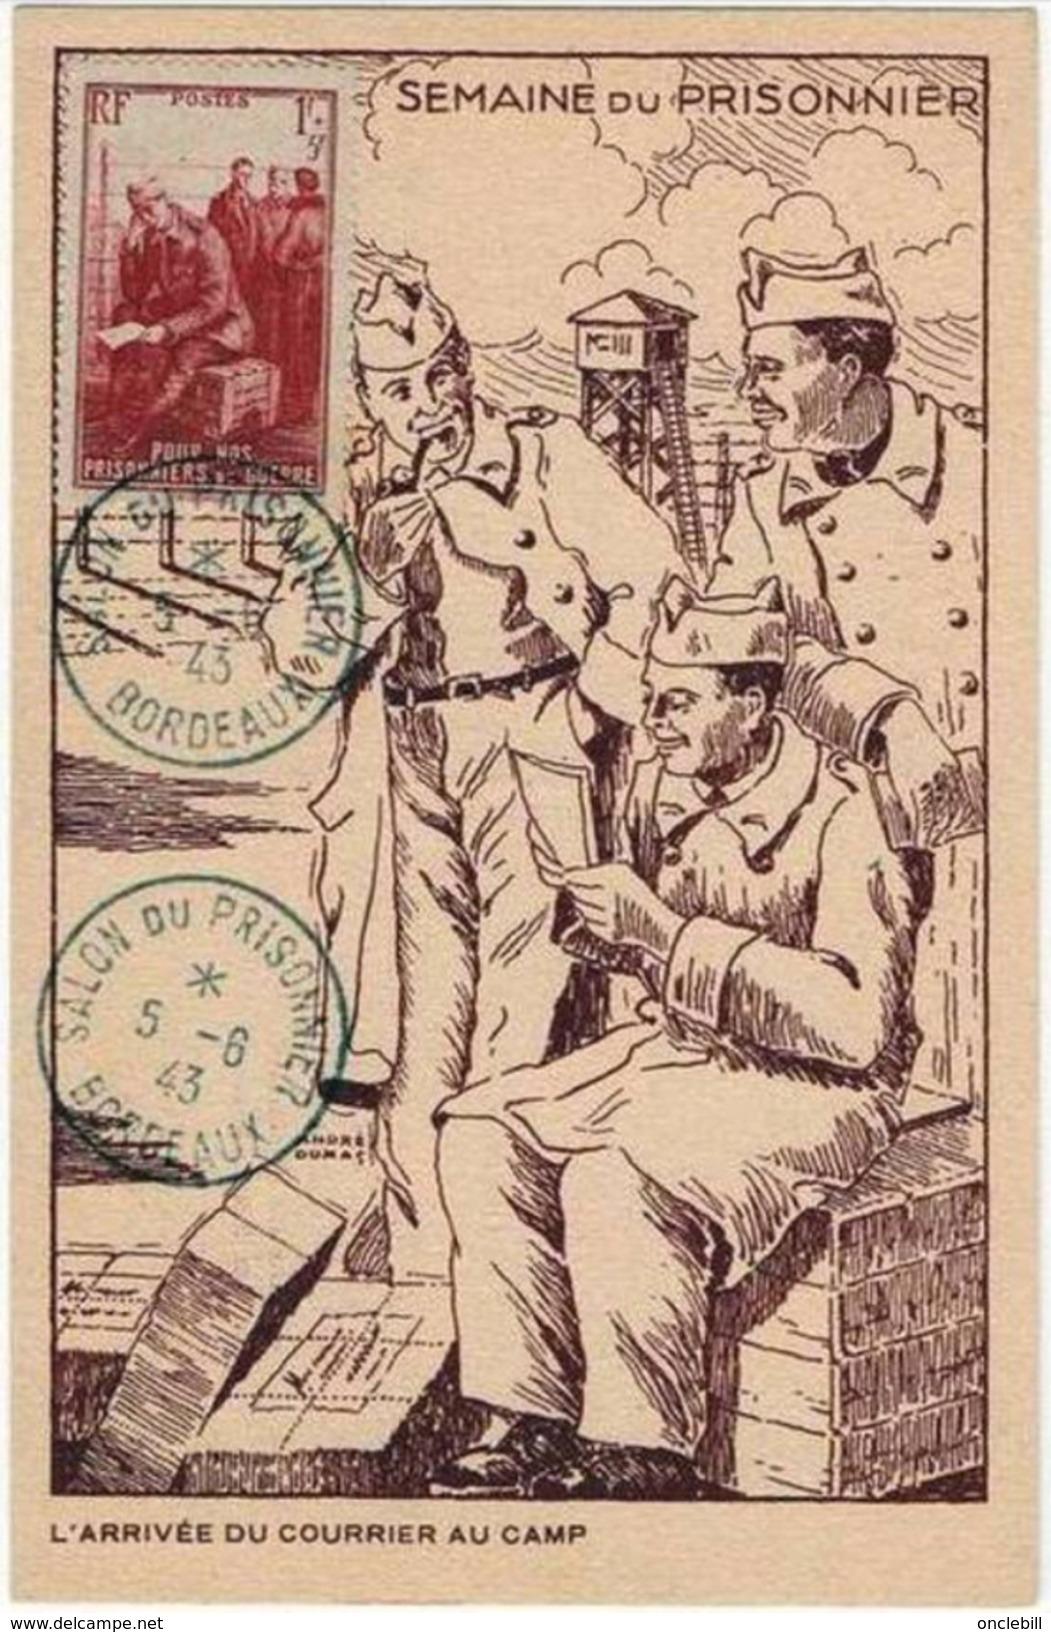 Bordeaux Gironde Salon Prisonnier Guerre 1943 Stalag Mirador TOP+++ état Superbe - Guerre 1939-45